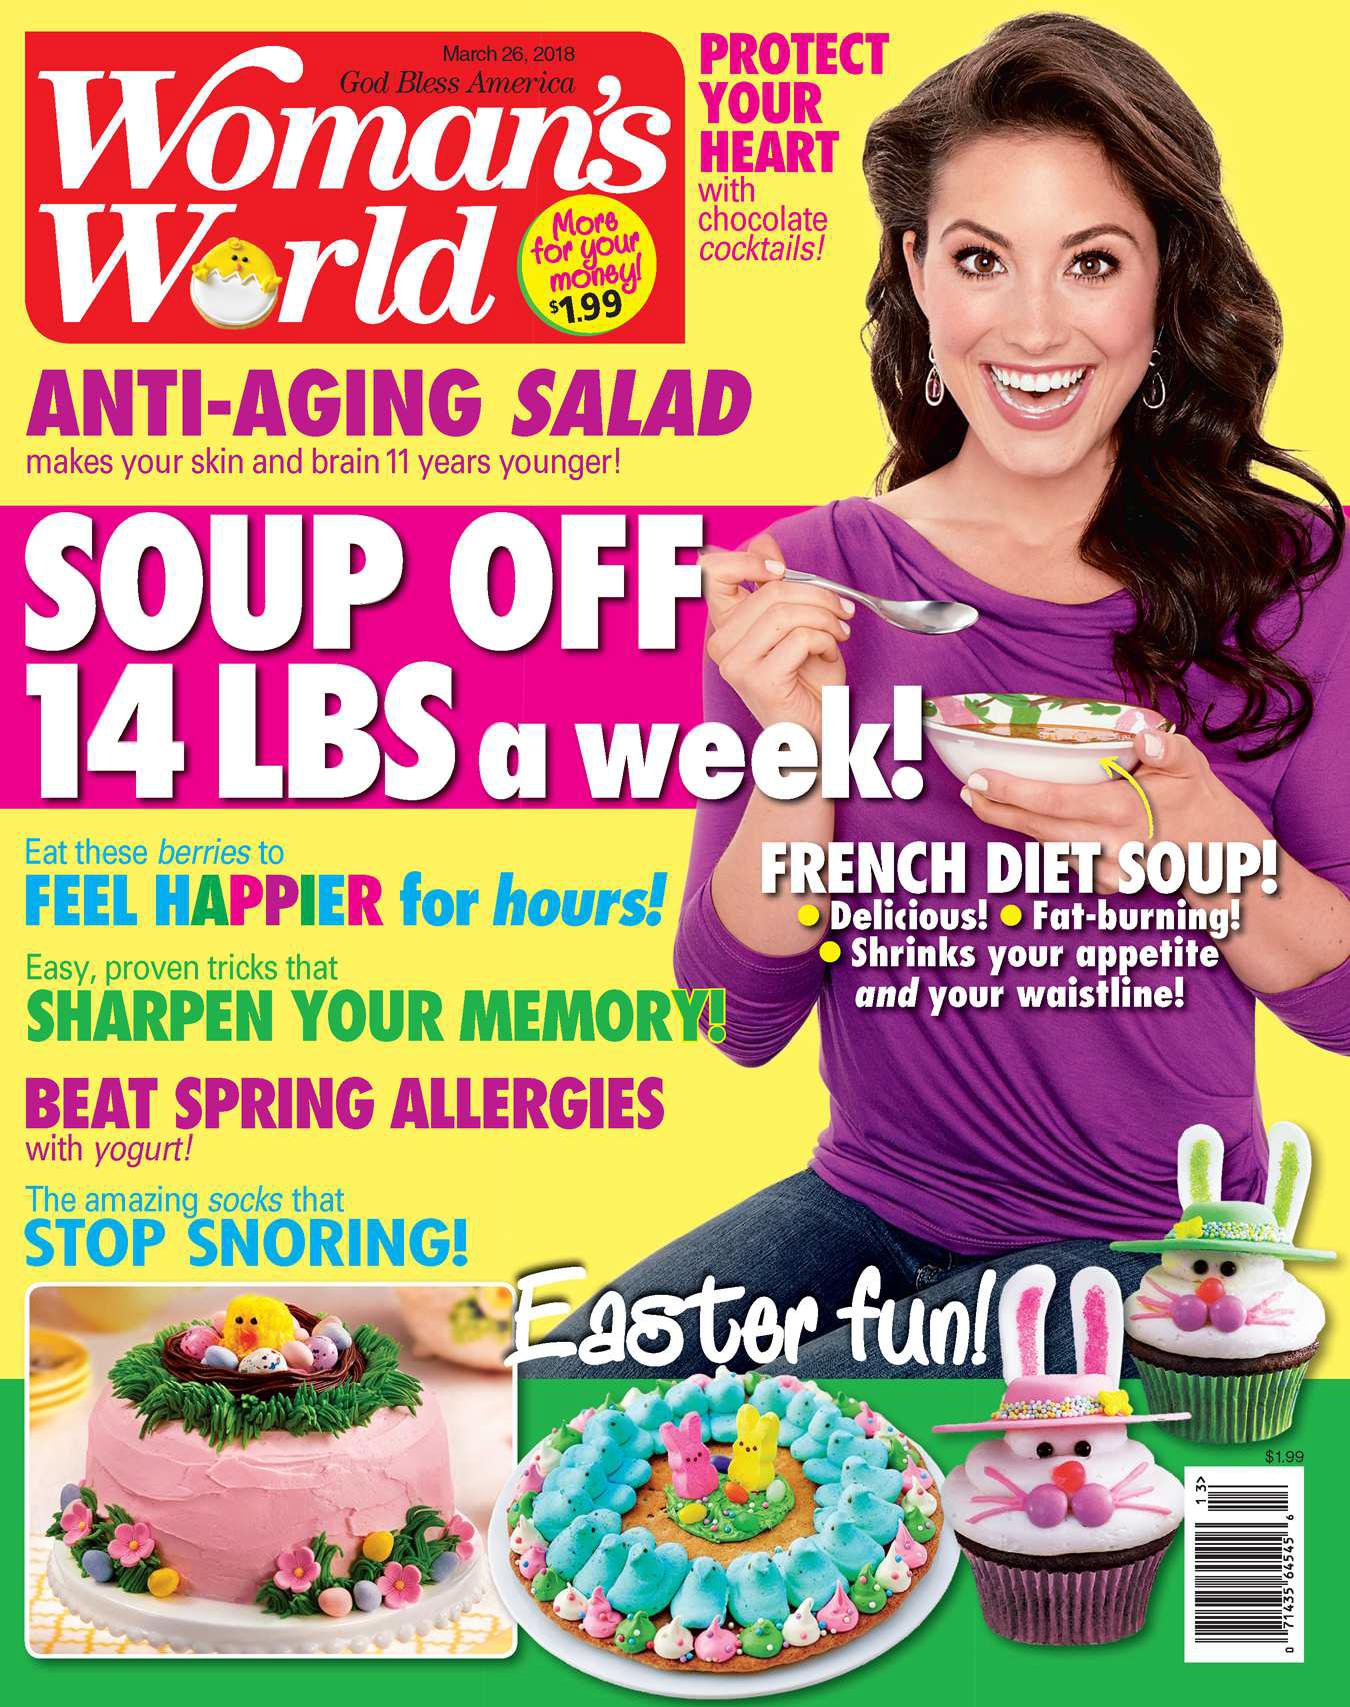 Denise Cerreta - Woman's World Magazine USA March 26 2018_Page_1.png